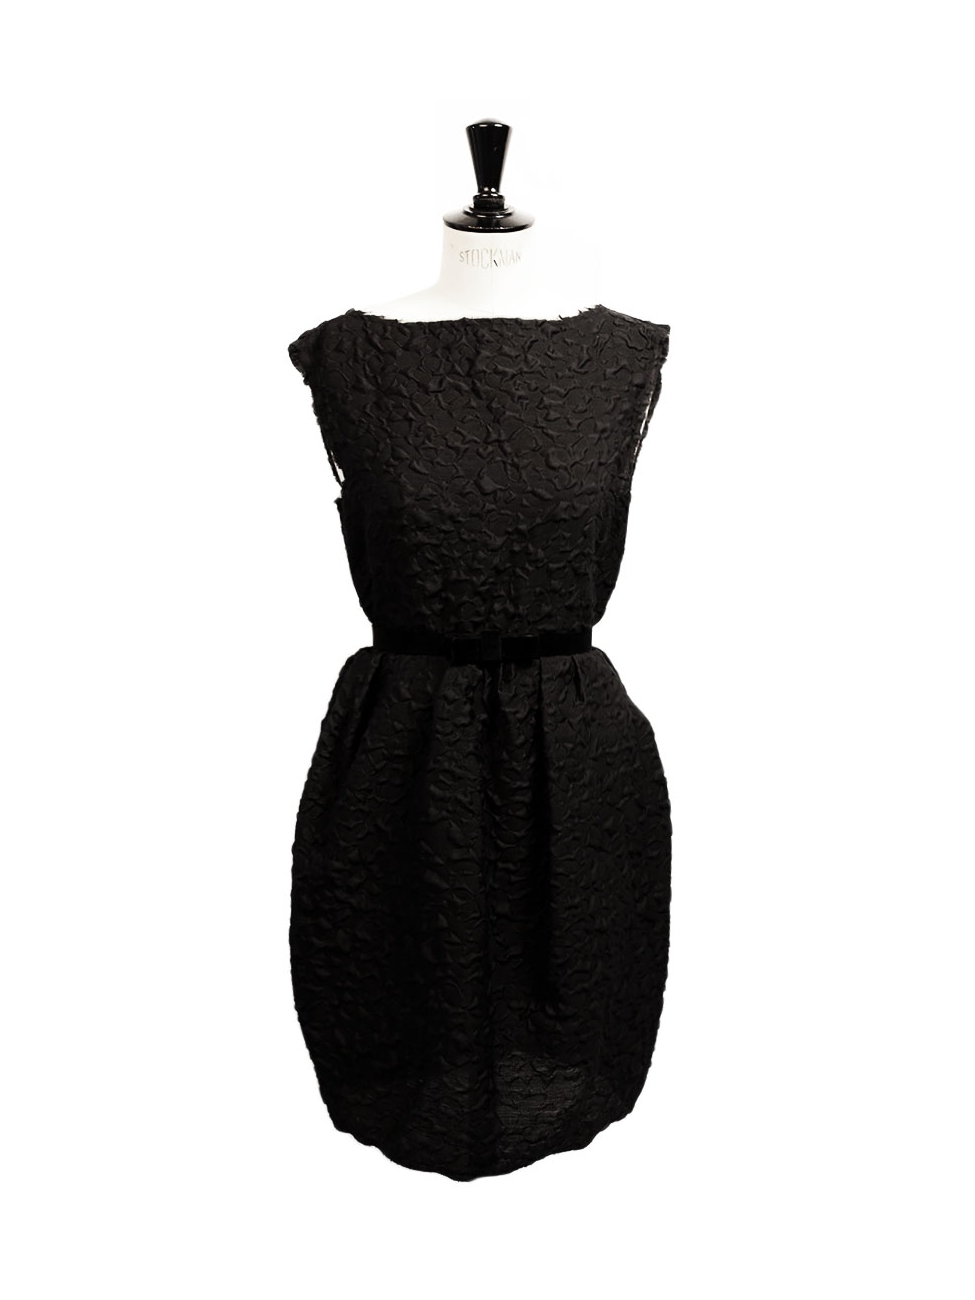 fb1195343952 Louise Paris - LANVIN Black wool and silk-blend open back cinched cloque cocktail  dress Retail price €1600 Size 38